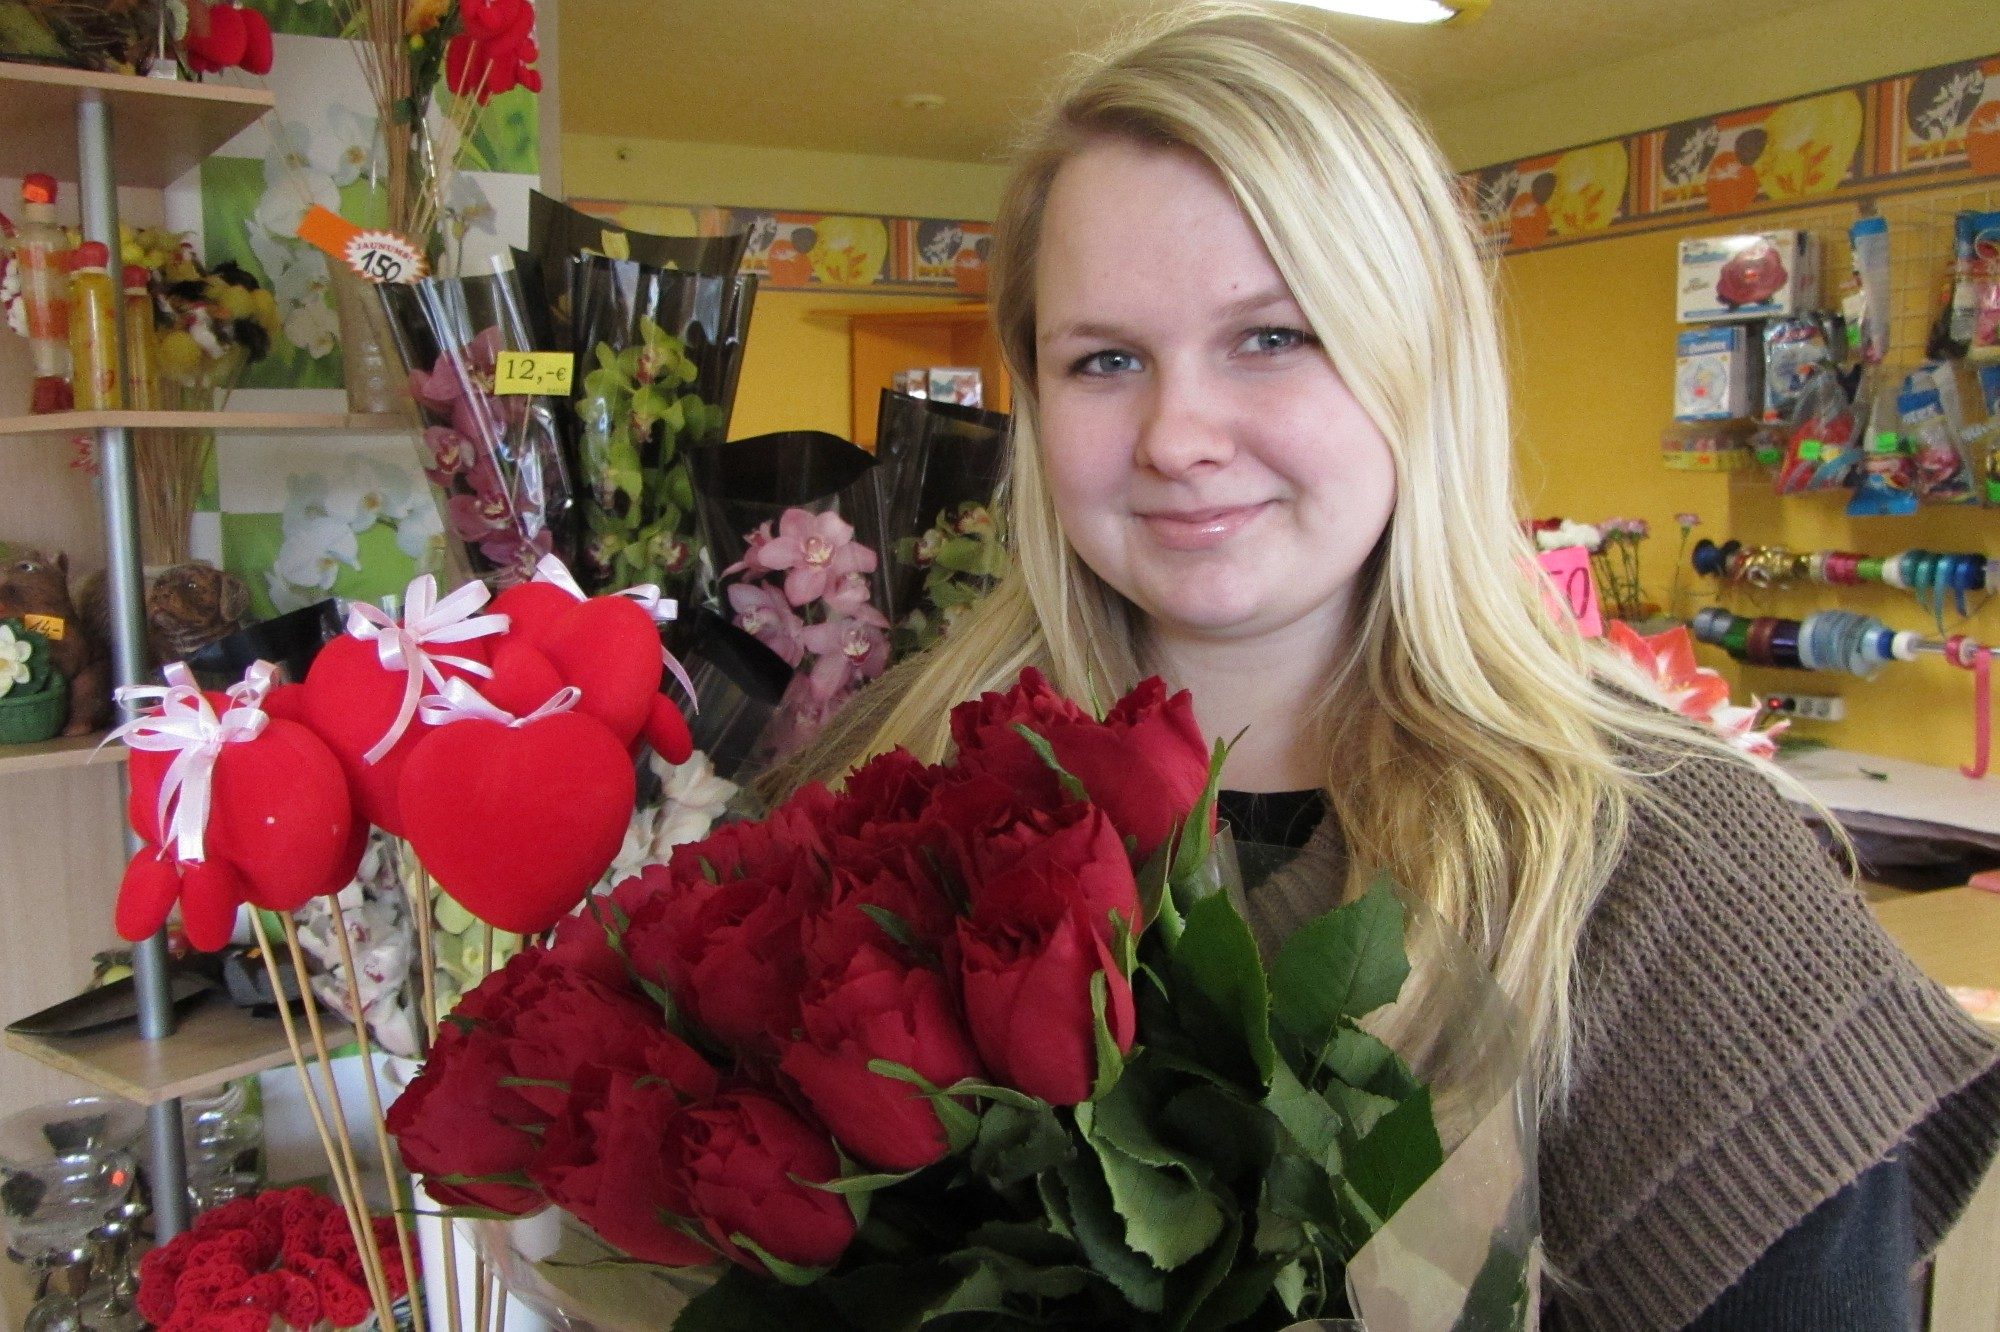 Lelde Maškova: Sarkanā – mīlestības krāsa